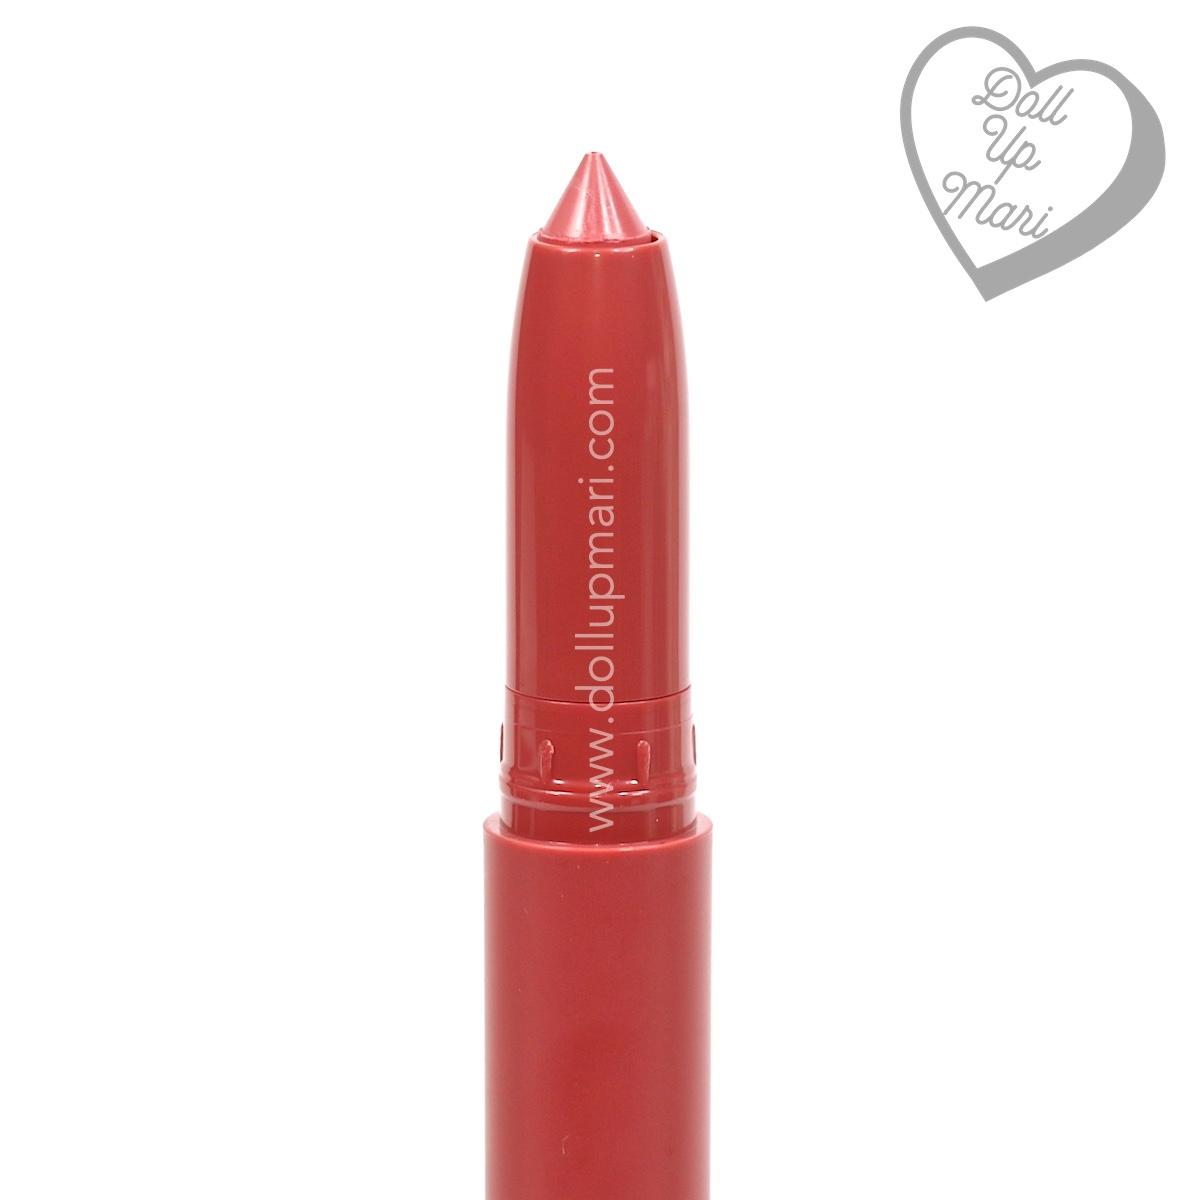 85 Change Is Good shade of Maybelline Superstay Ink Crayon 8HR Longwear Matte Lipstick